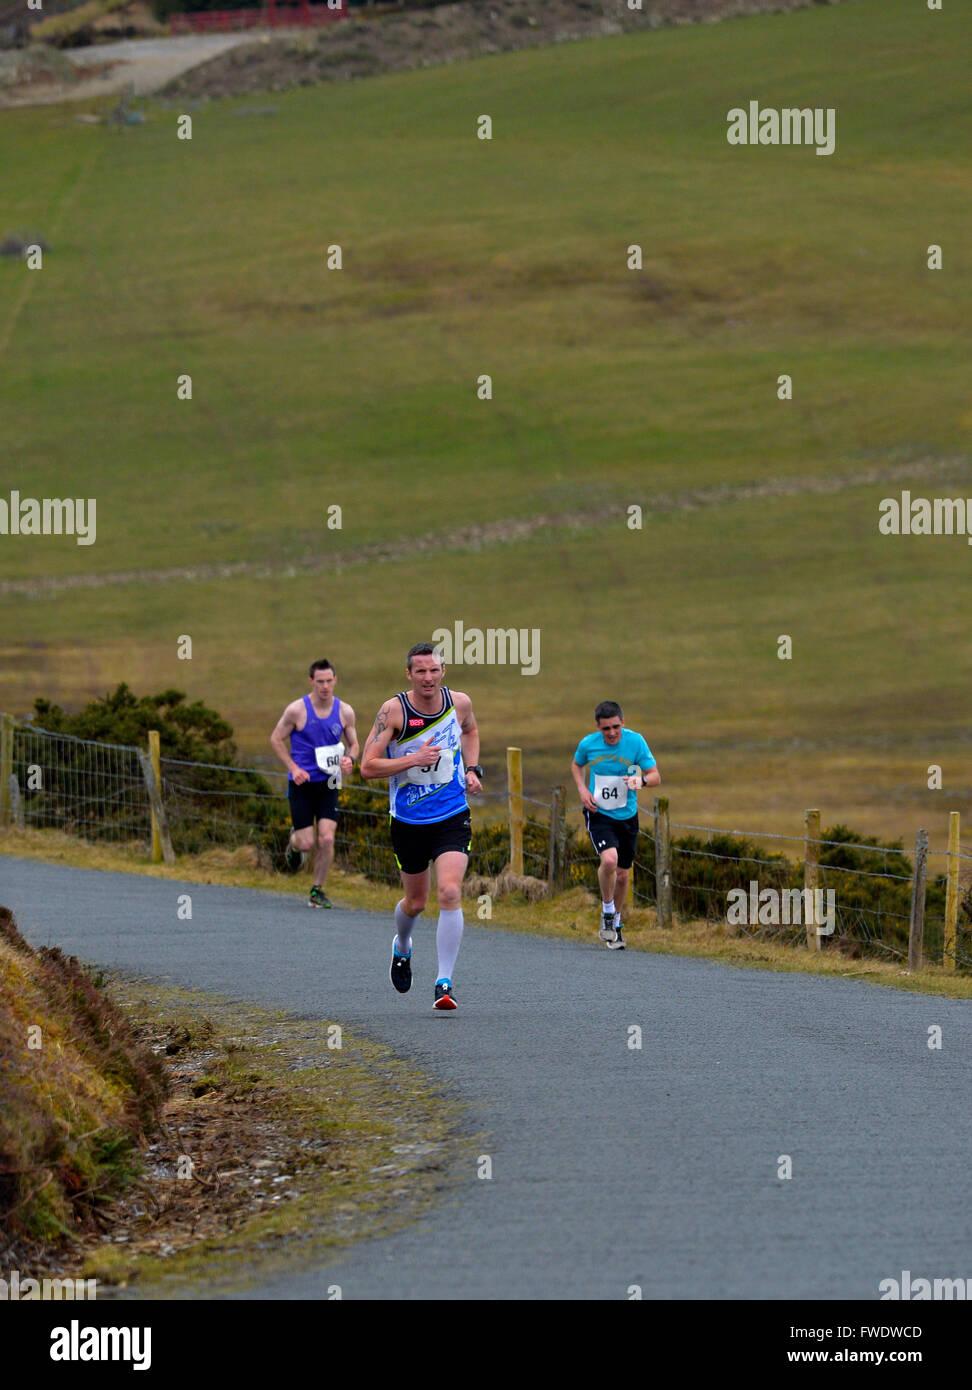 Guide di scorrimento in concorrenza in salita re di The Warriors road race in Burt, County Donegal, Irlanda. Immagini Stock